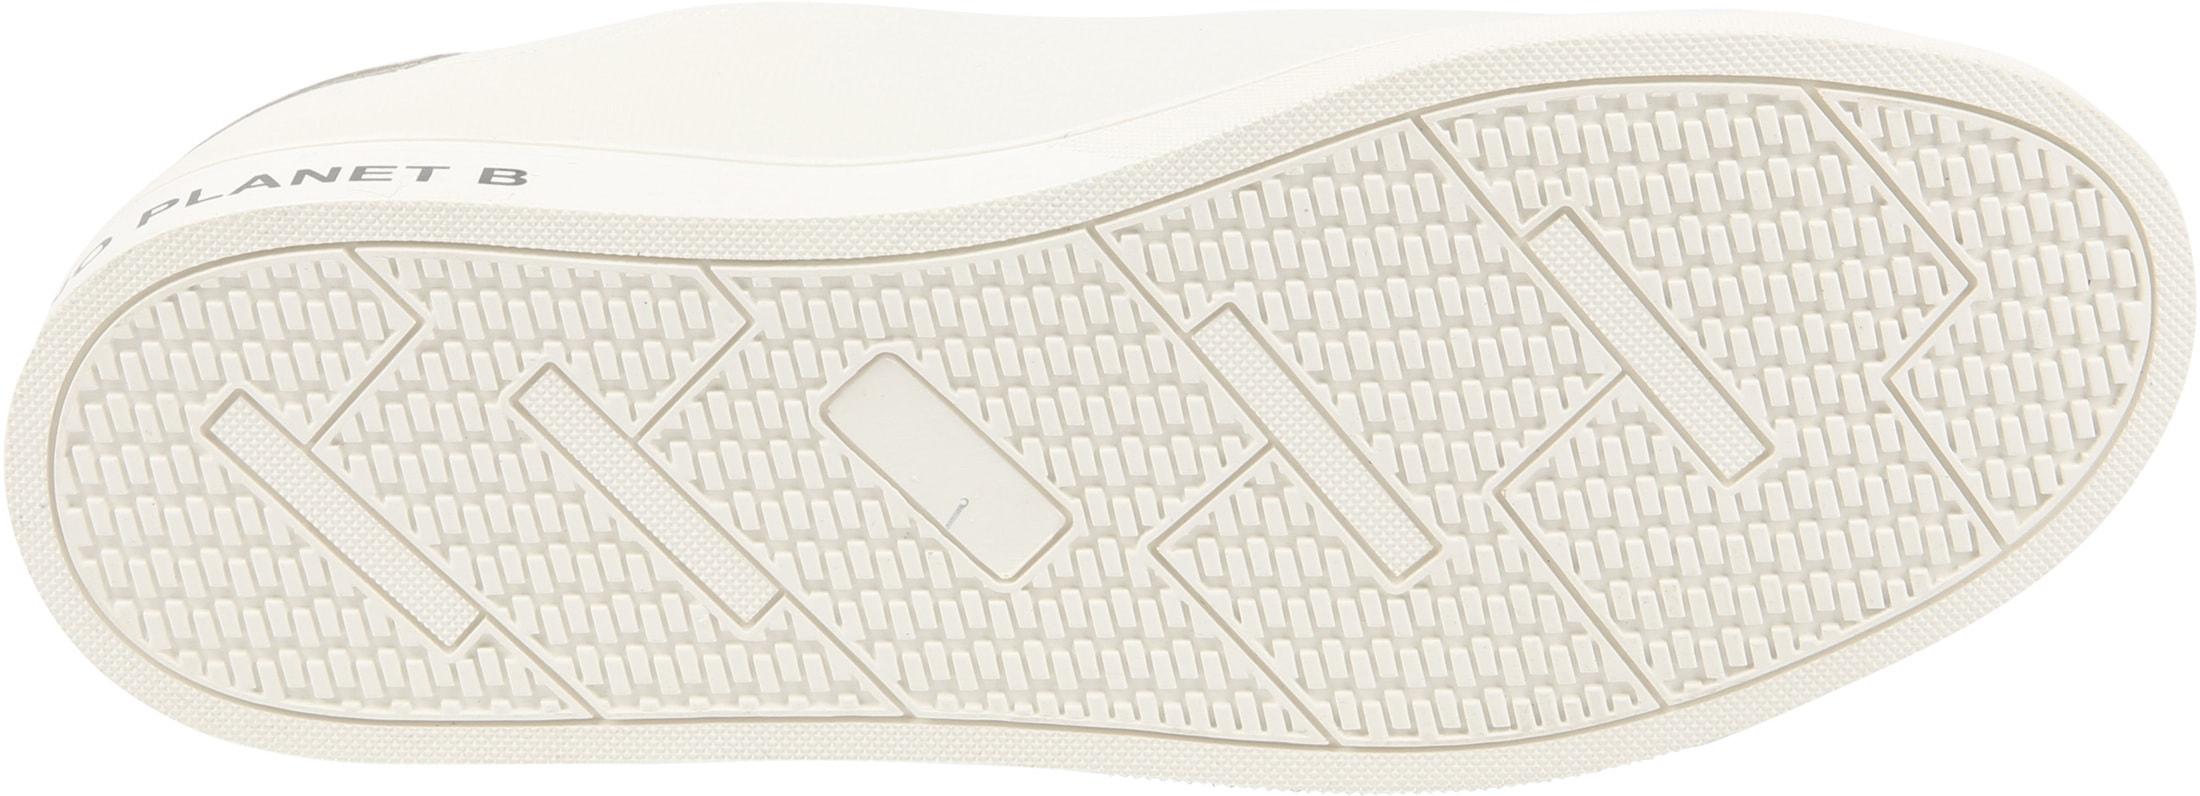 Ecoalf Sneaker Sanford Off-White foto 4